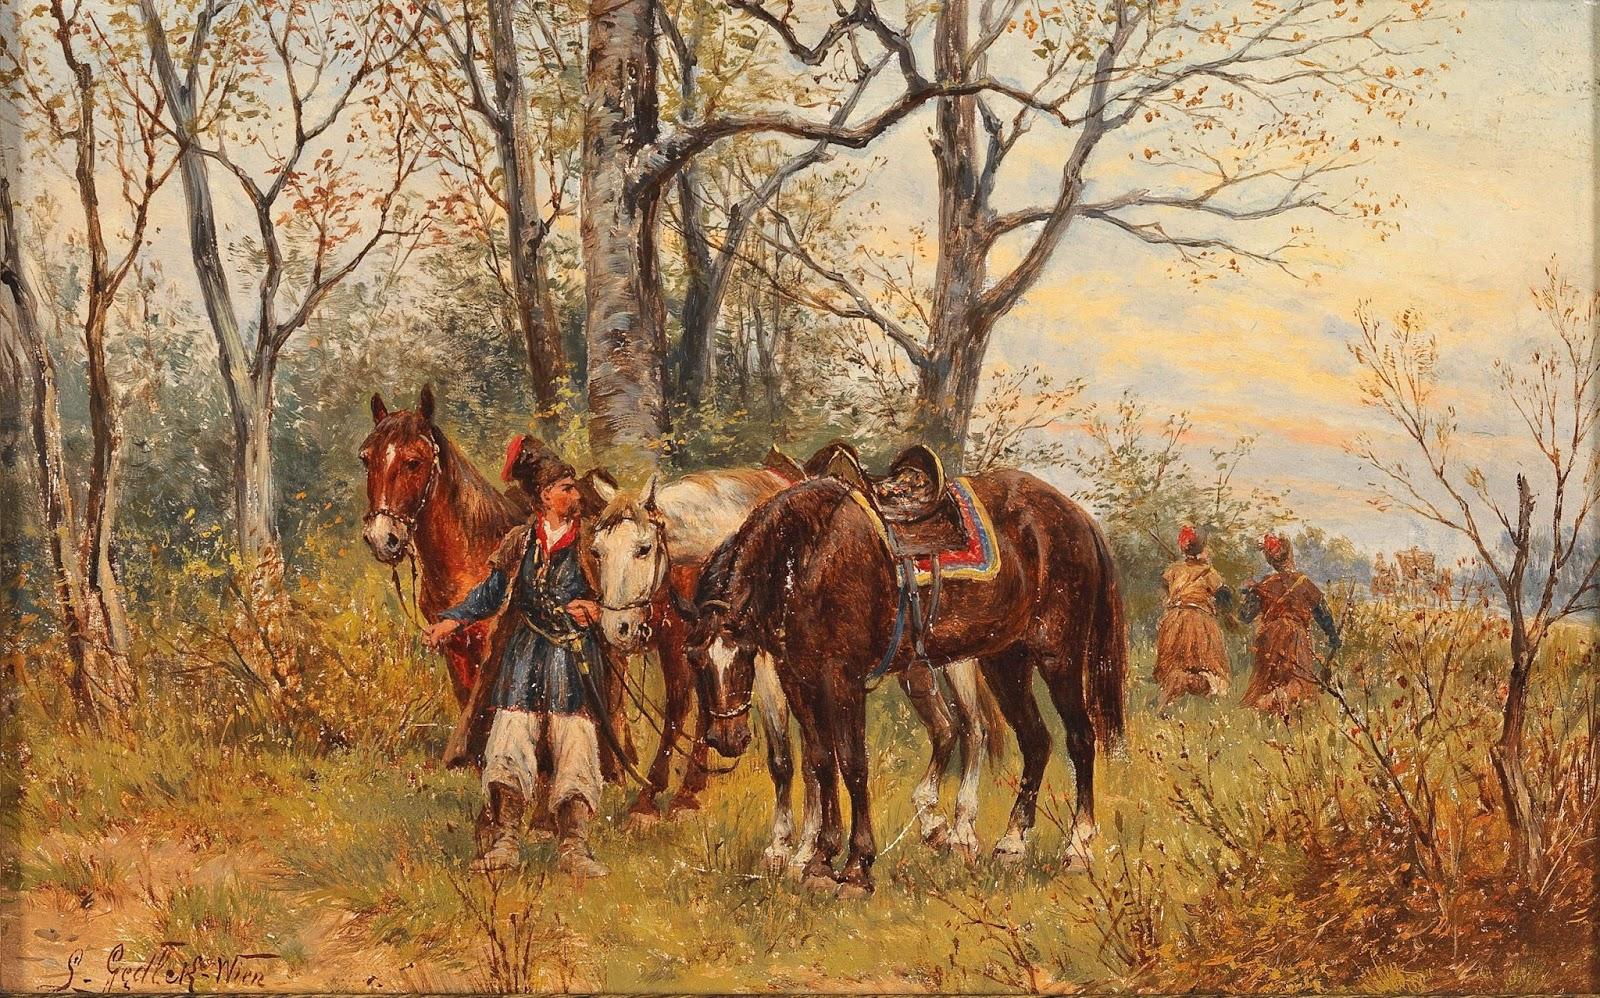 3 Ludwig_Gedlek_Kosakenpatrouille   Cossack patrol.jpg